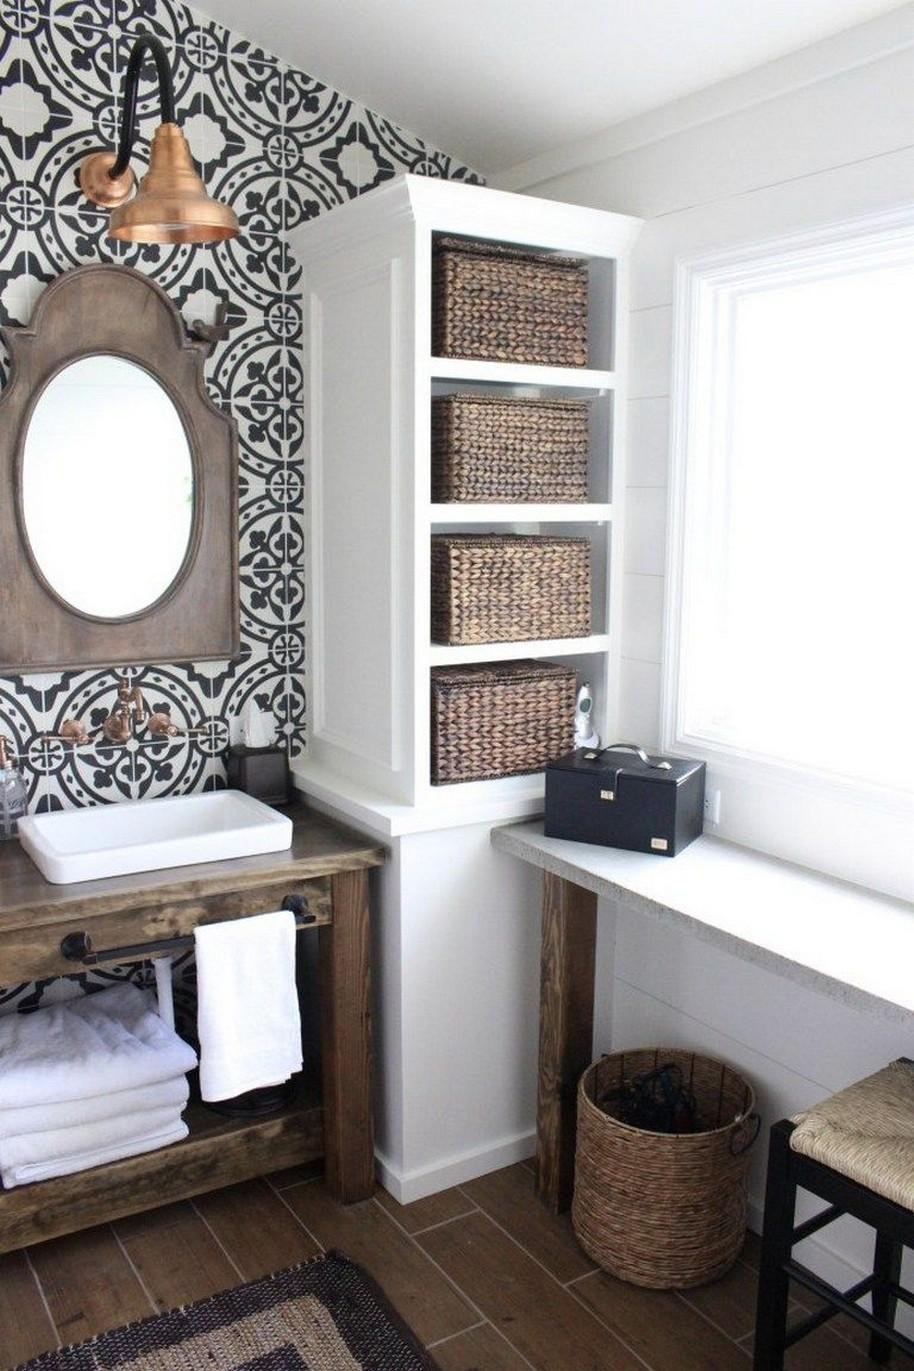 83 Modern Bathroom Design Some Tips Home Decor 12